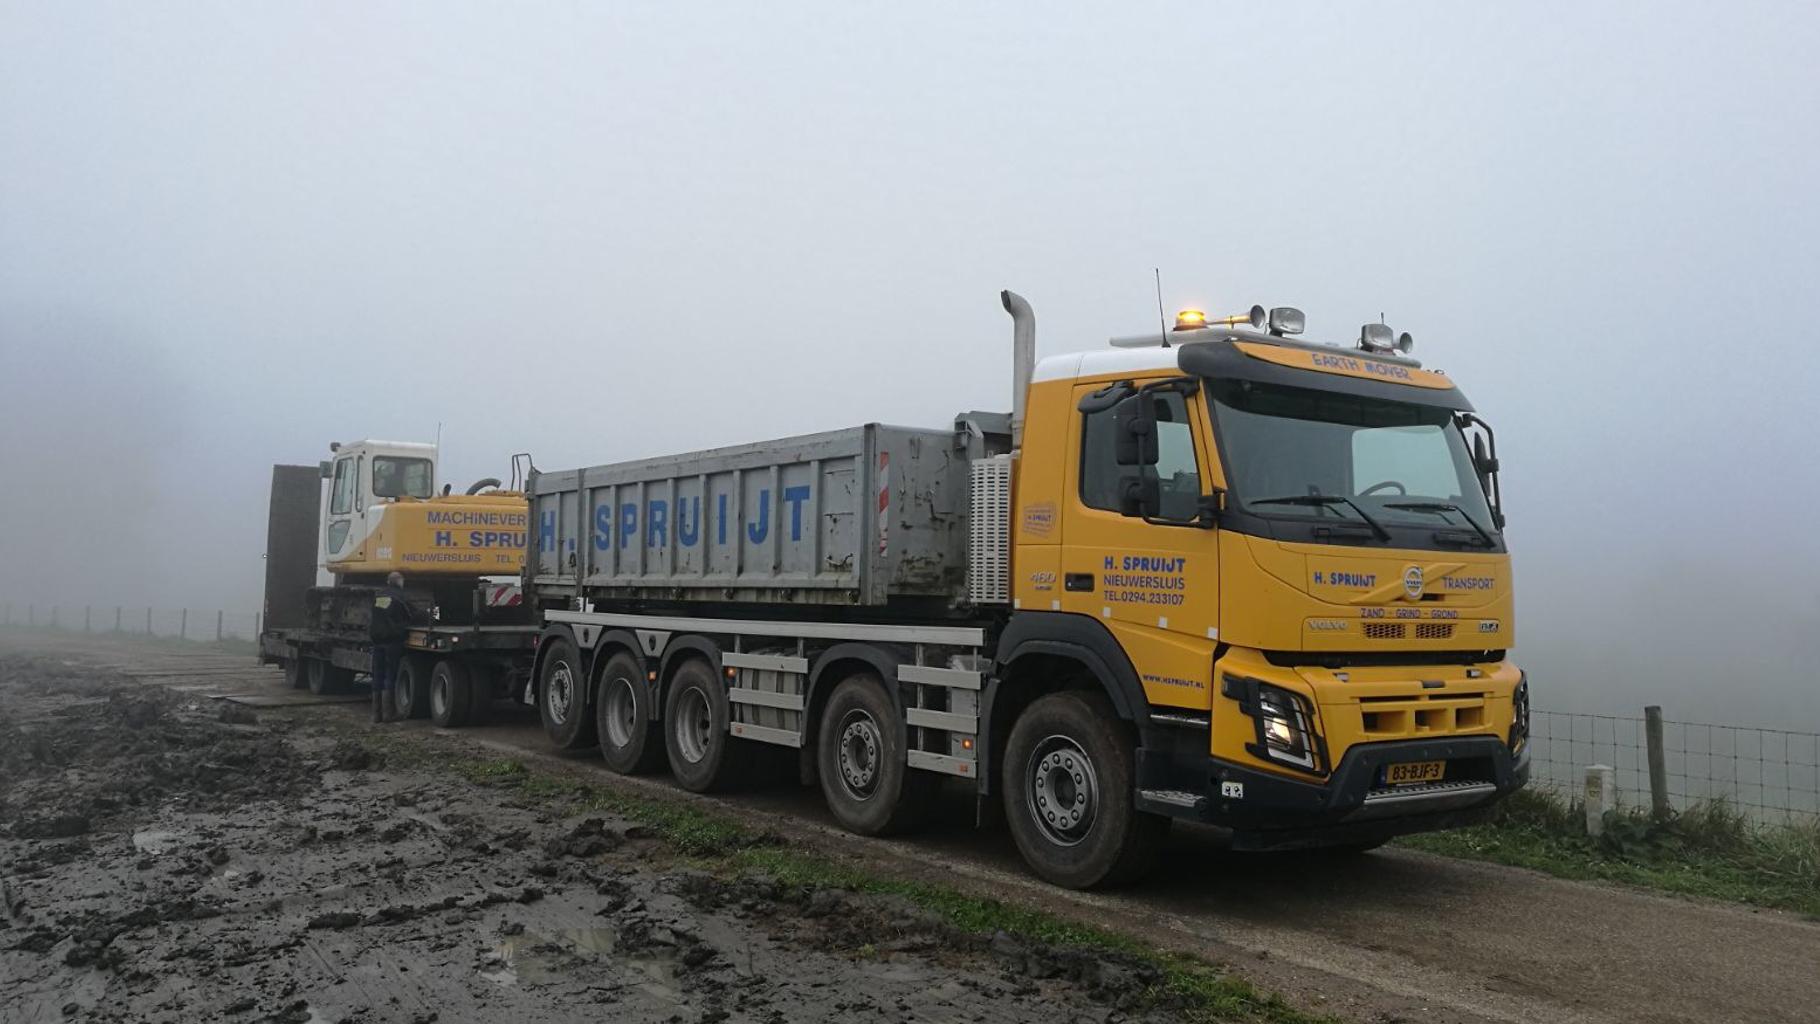 HSPRUIJT transport dieplader